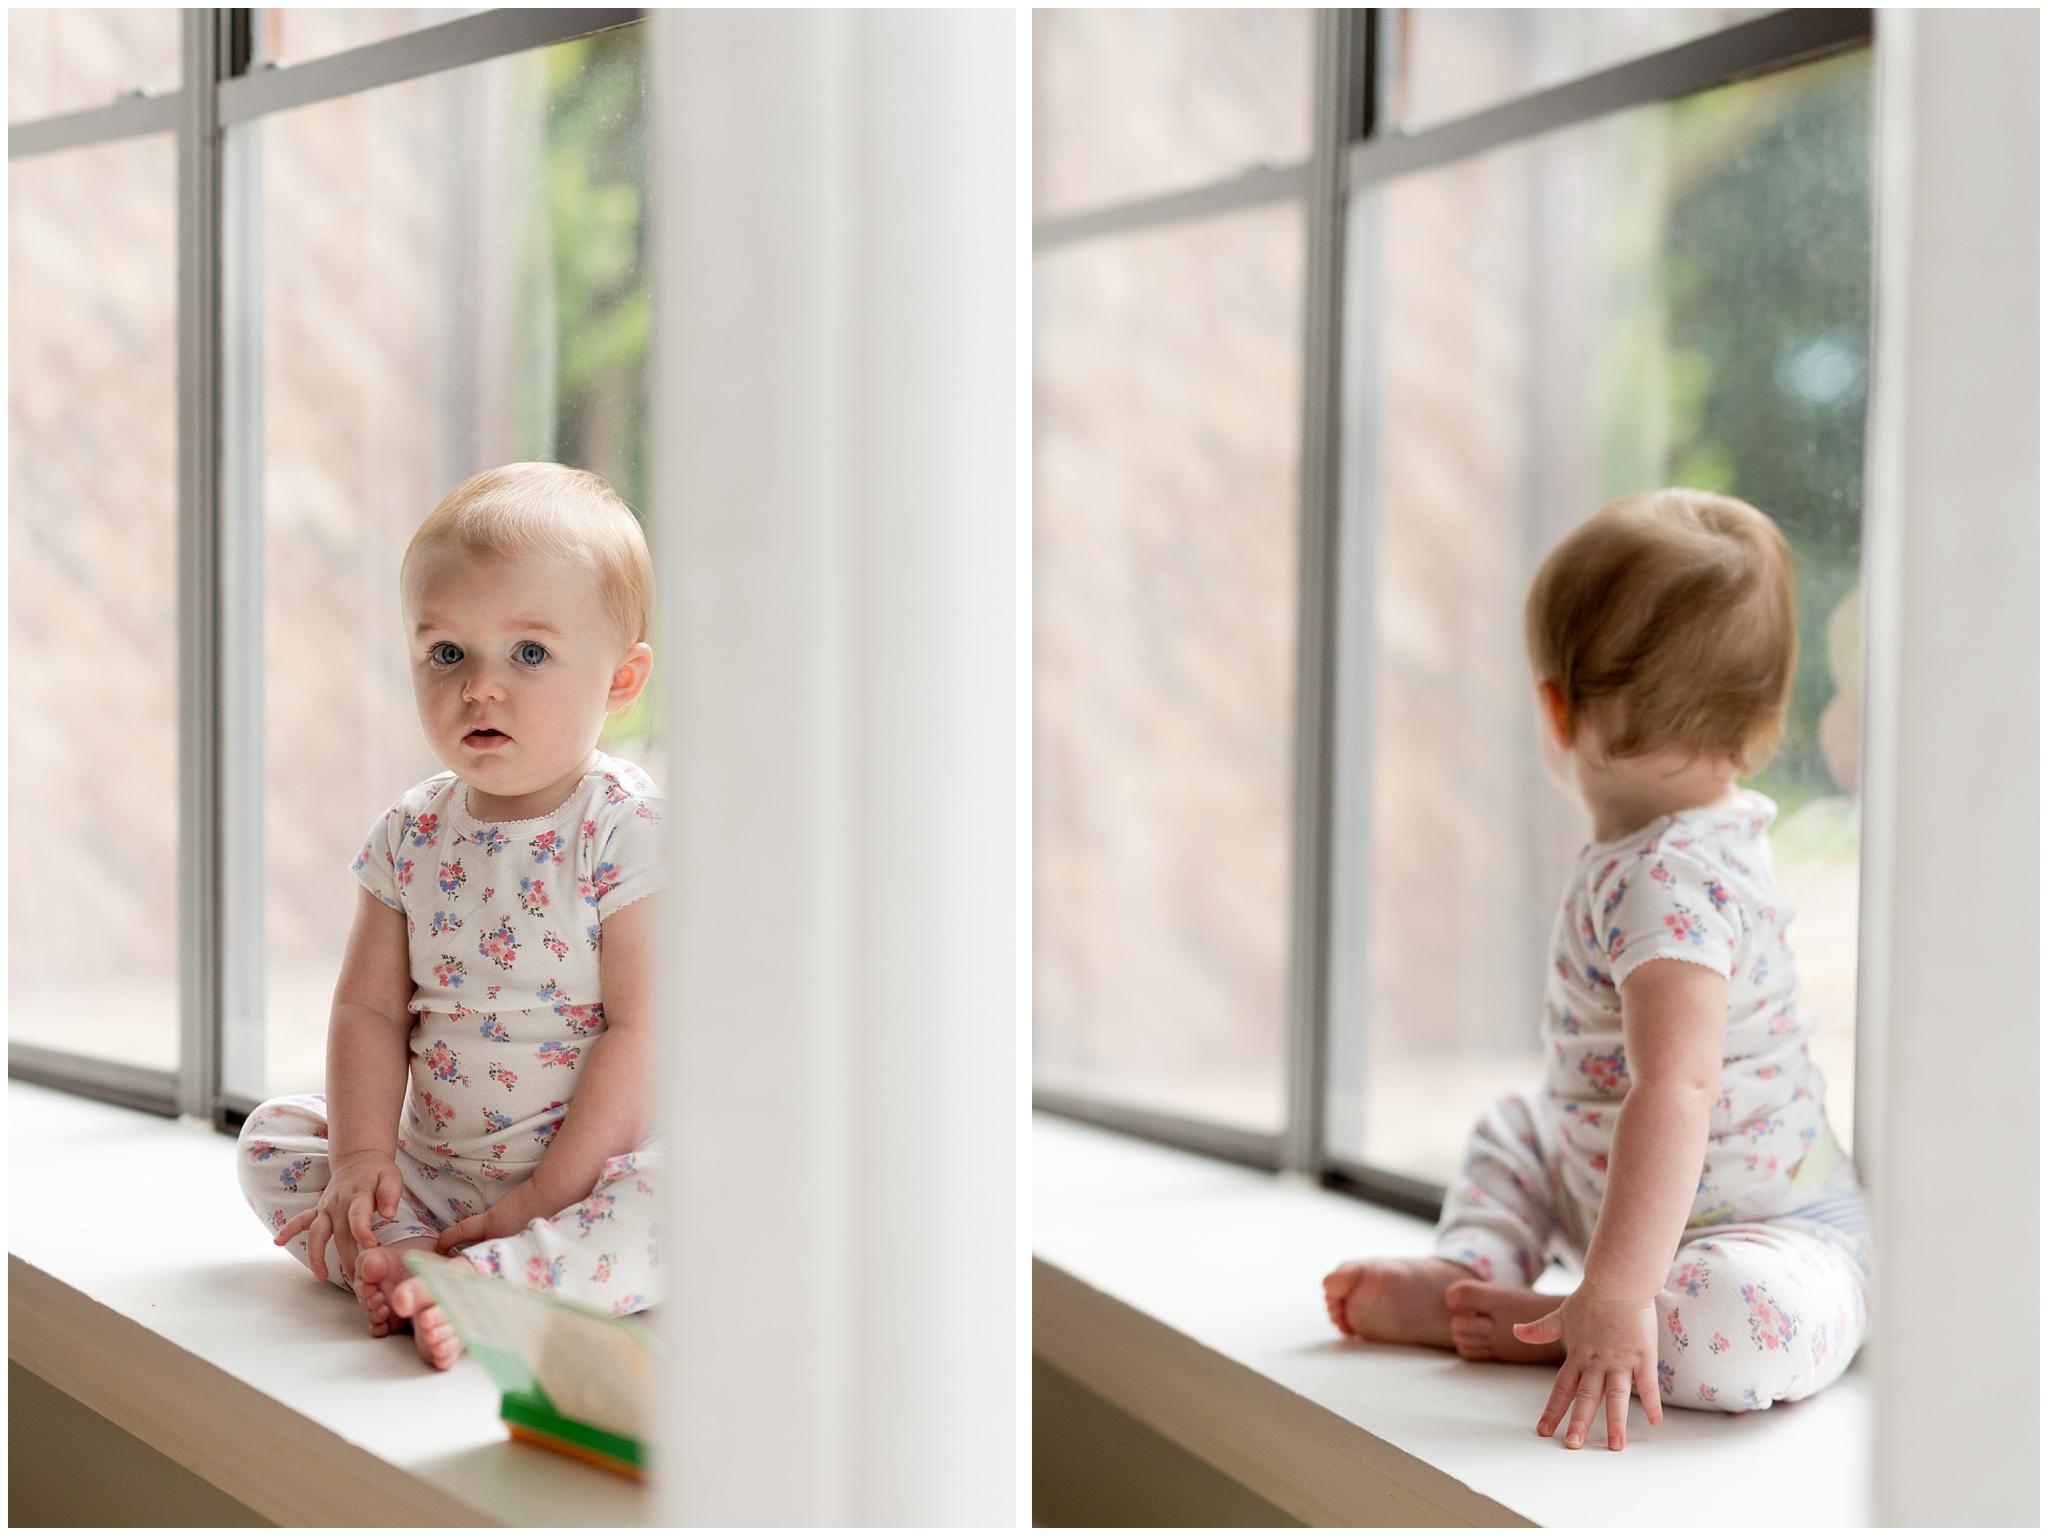 adorable baby girl sitting in windowsill in pajamas